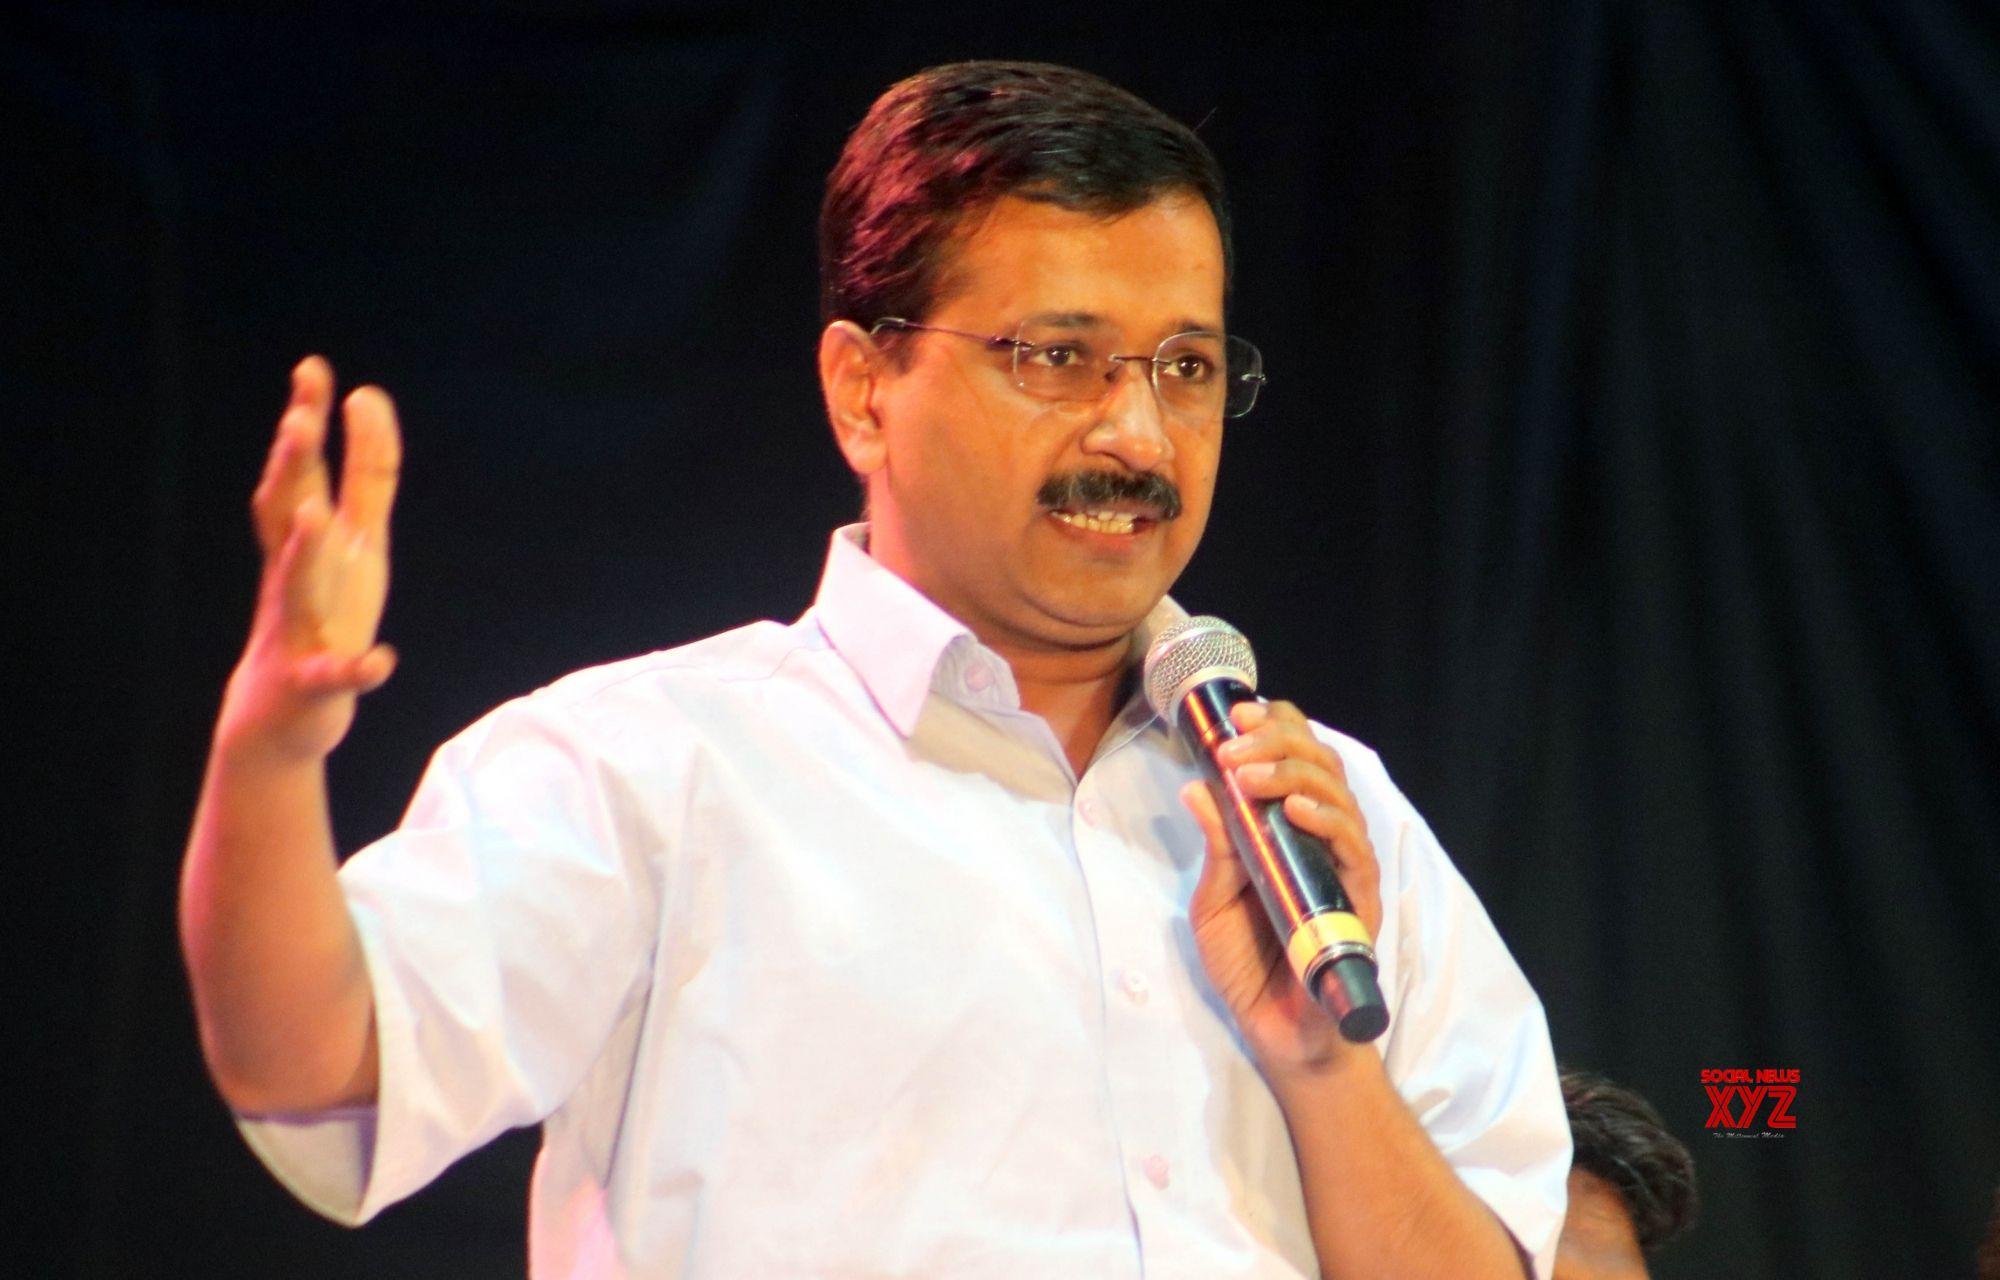 Delhi to get 11,000 WiFi hotspots in 6 months: Kejriwal